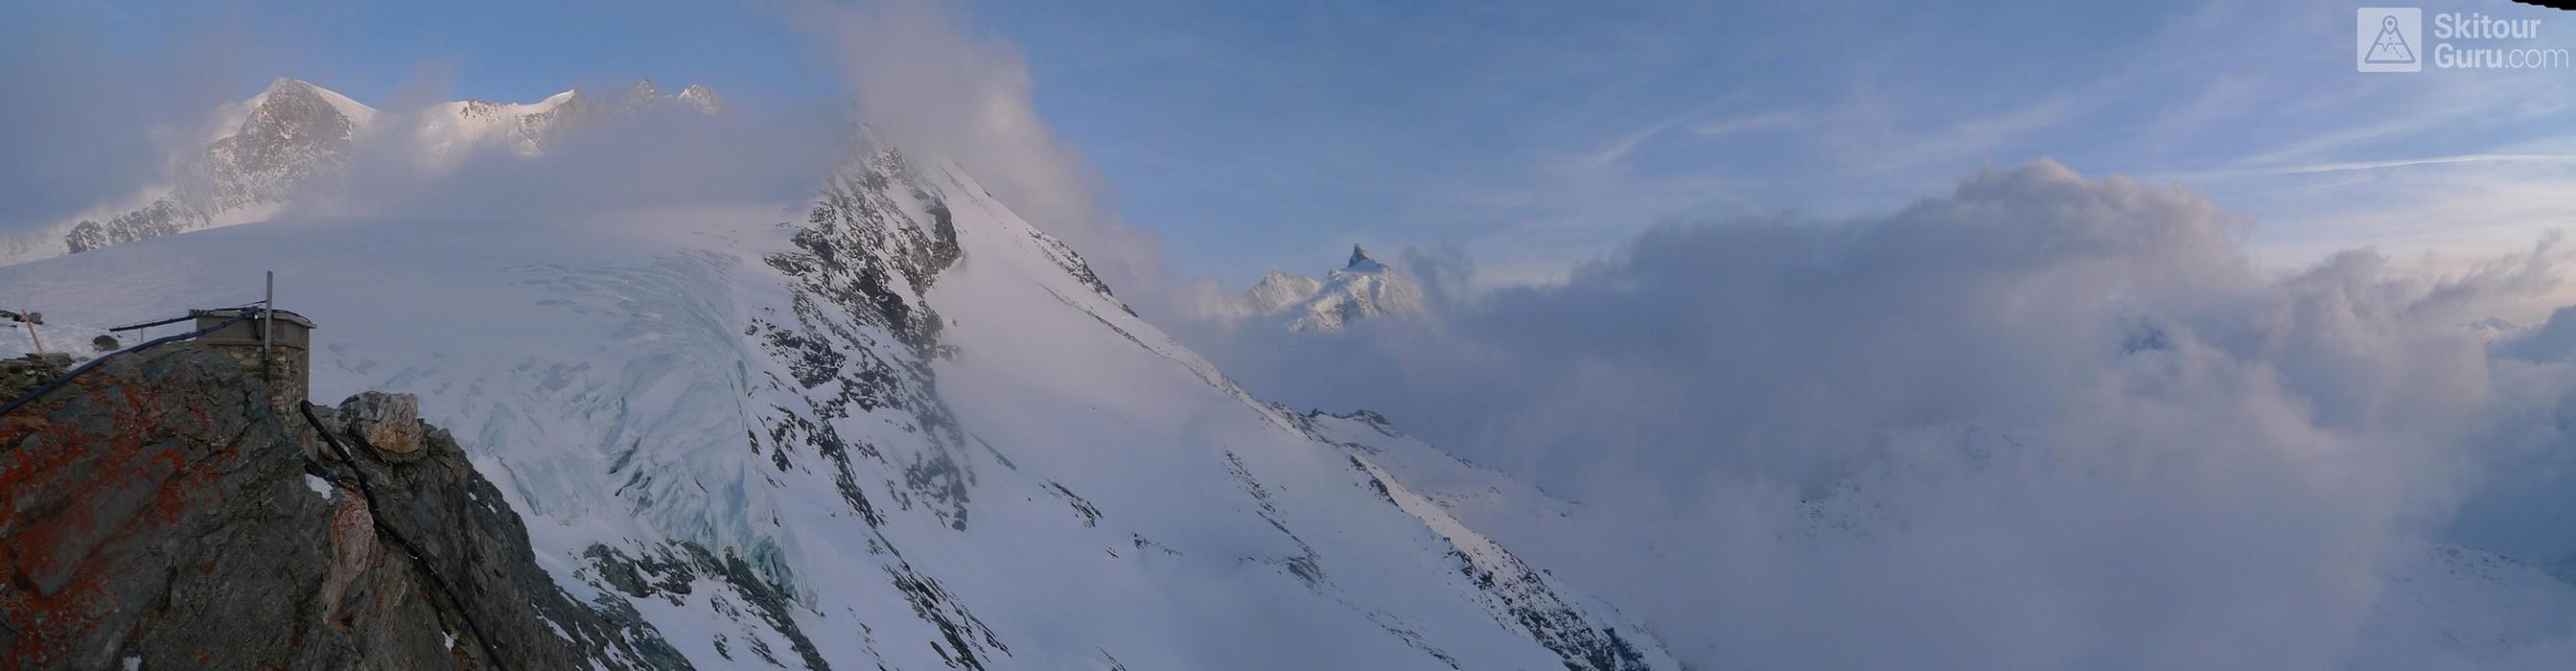 Cabane Tracuit Walliser Alpen / Alpes valaisannes Švýcarsko panorama 16